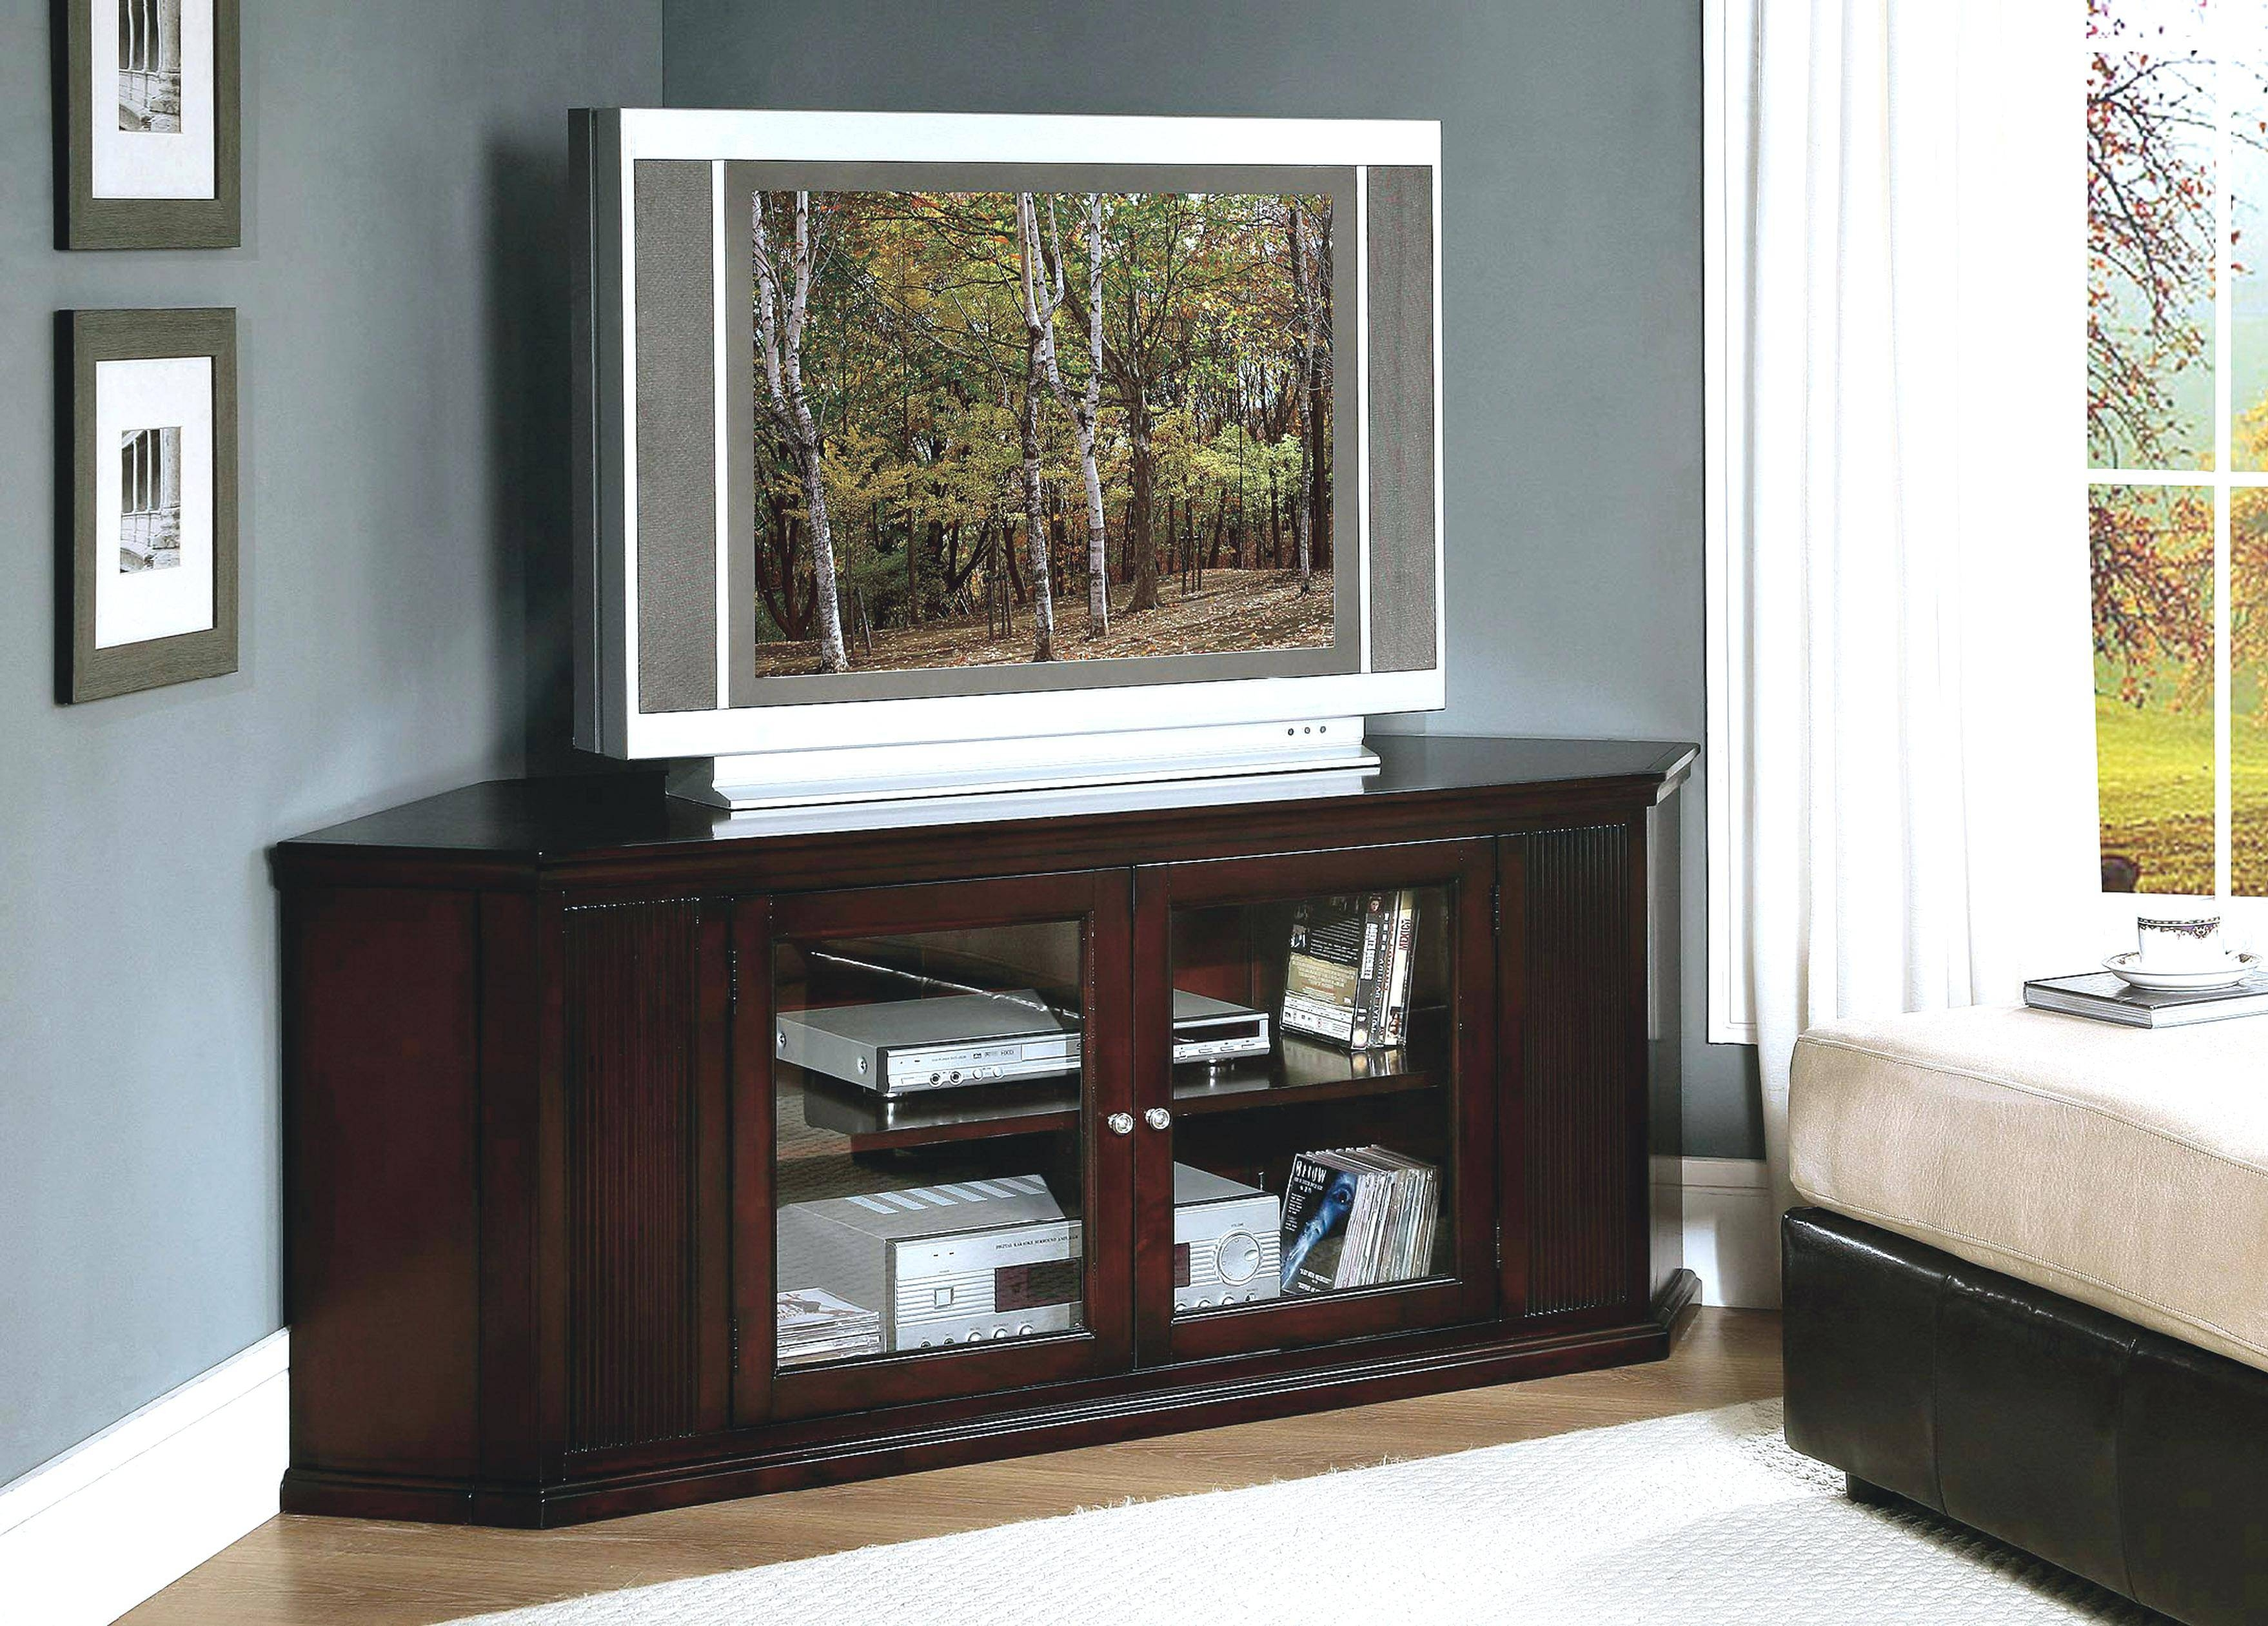 Tv Stand : 59 Amish Corner Tv Stand Splendid Amish Corner Tv Stand with Dark Brown Corner Tv Stands (Image 14 of 15)